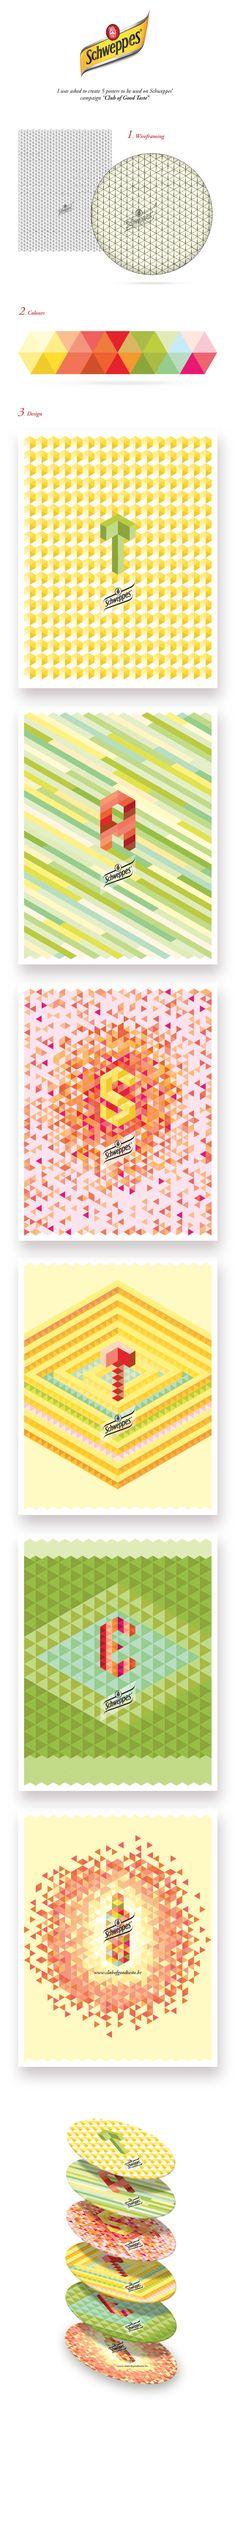 Schweppes Club of Good Taste Posters by Daniel Niño, via Behance